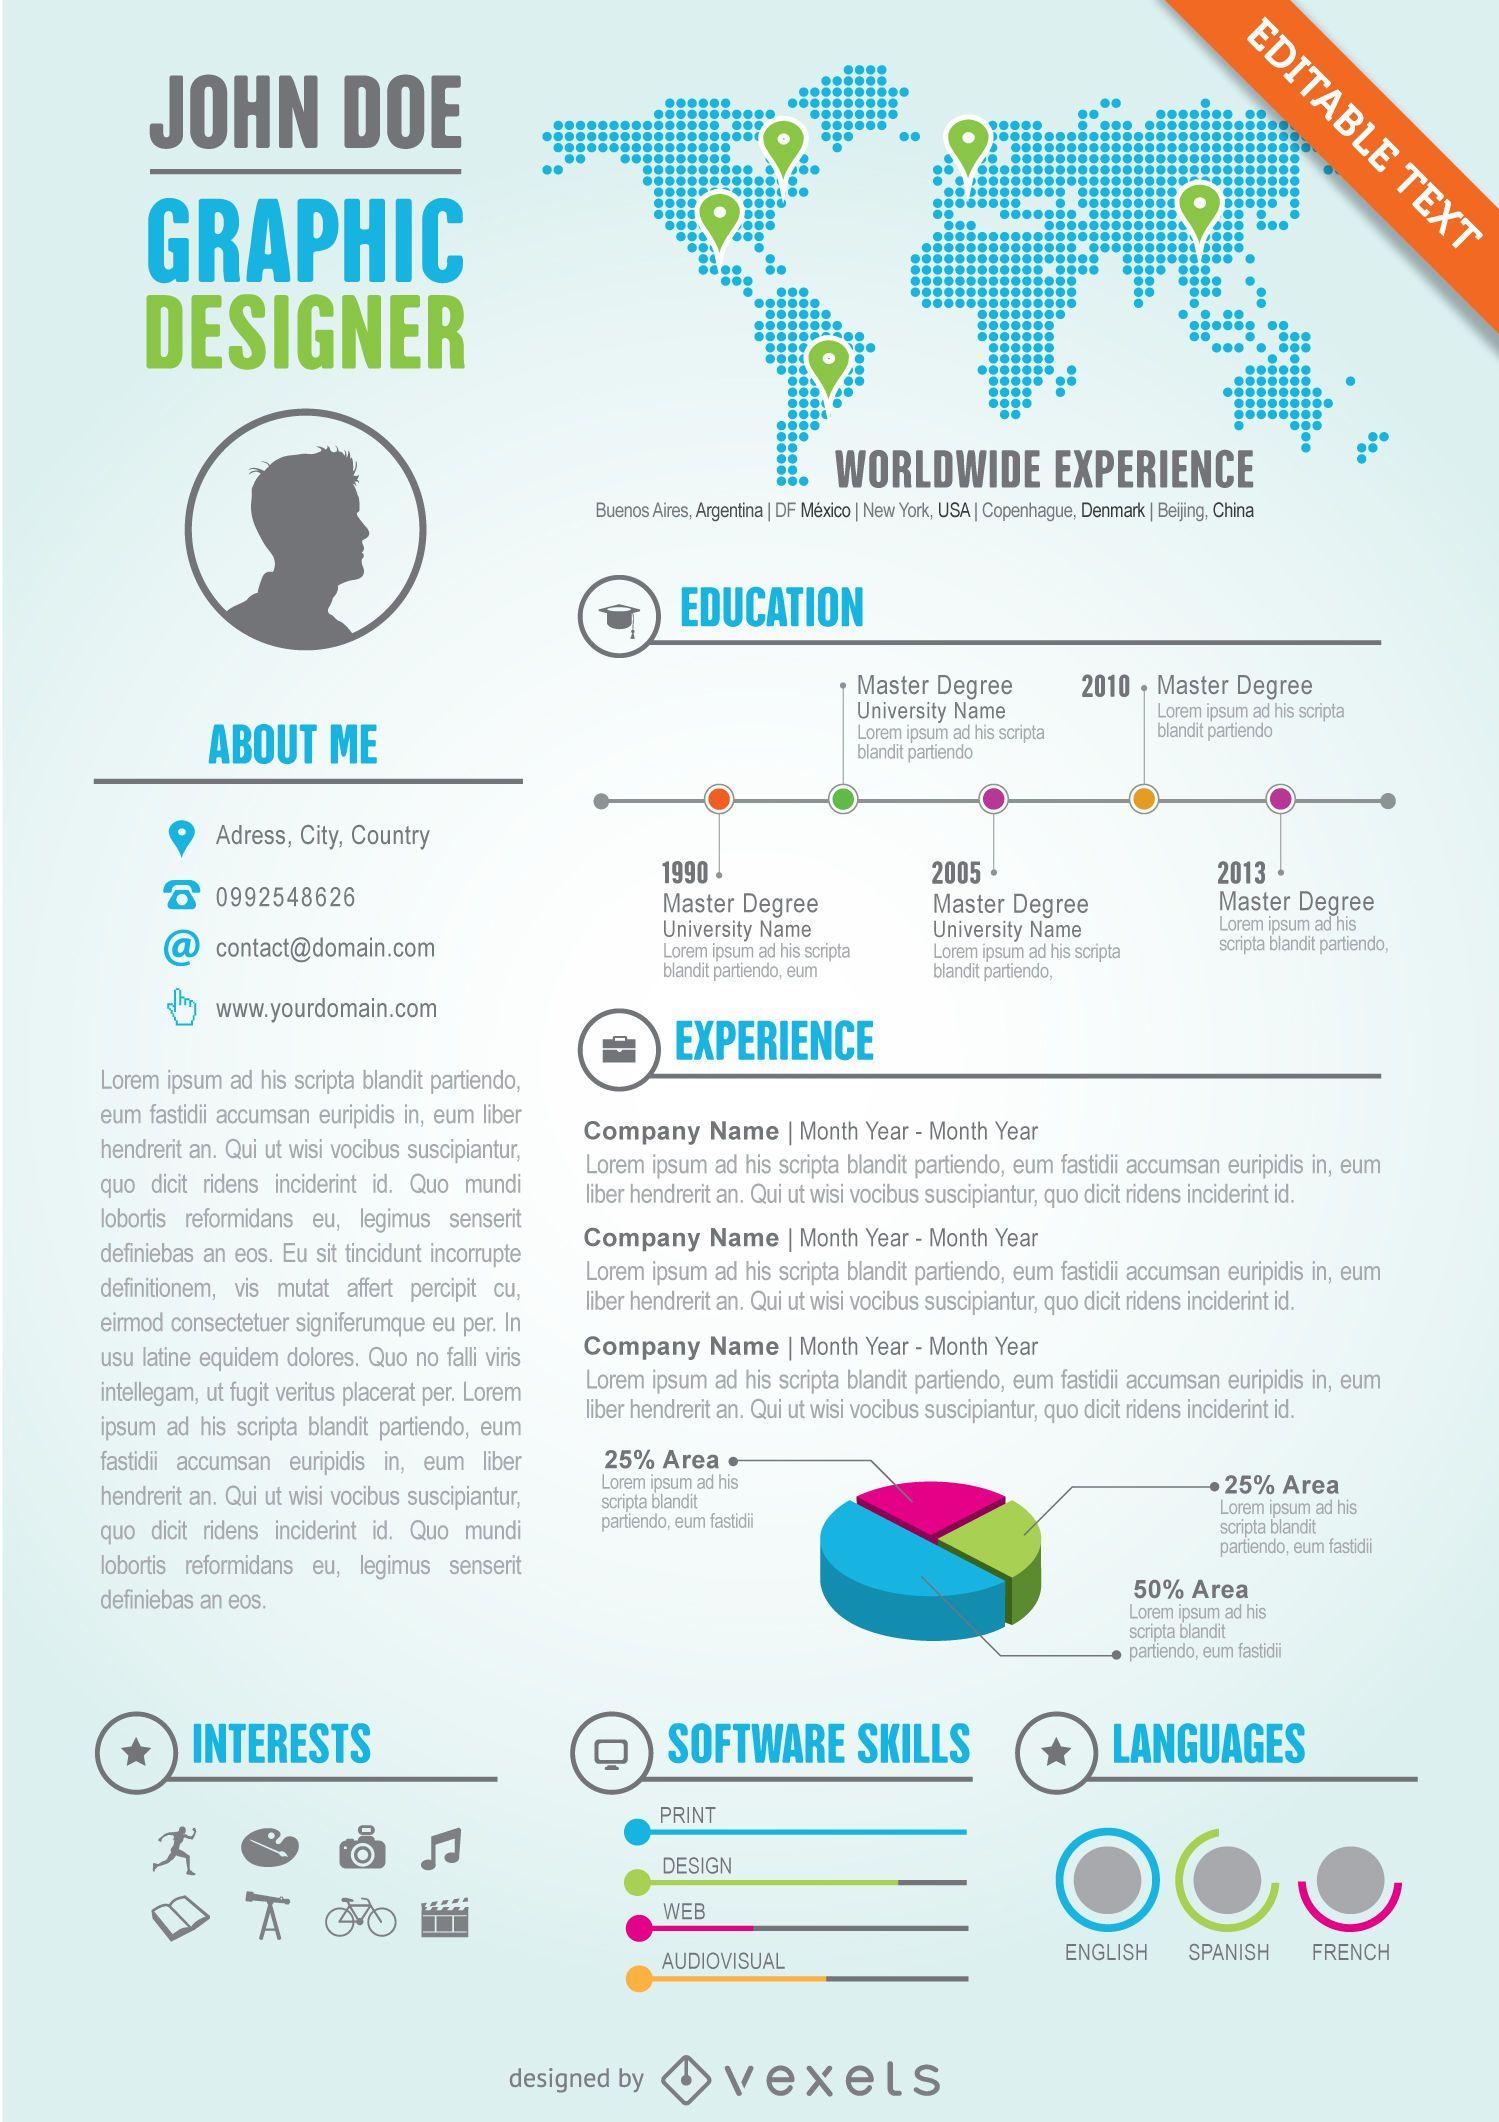 Graphic Designer editable resume cv template - Vector download - resume designer online